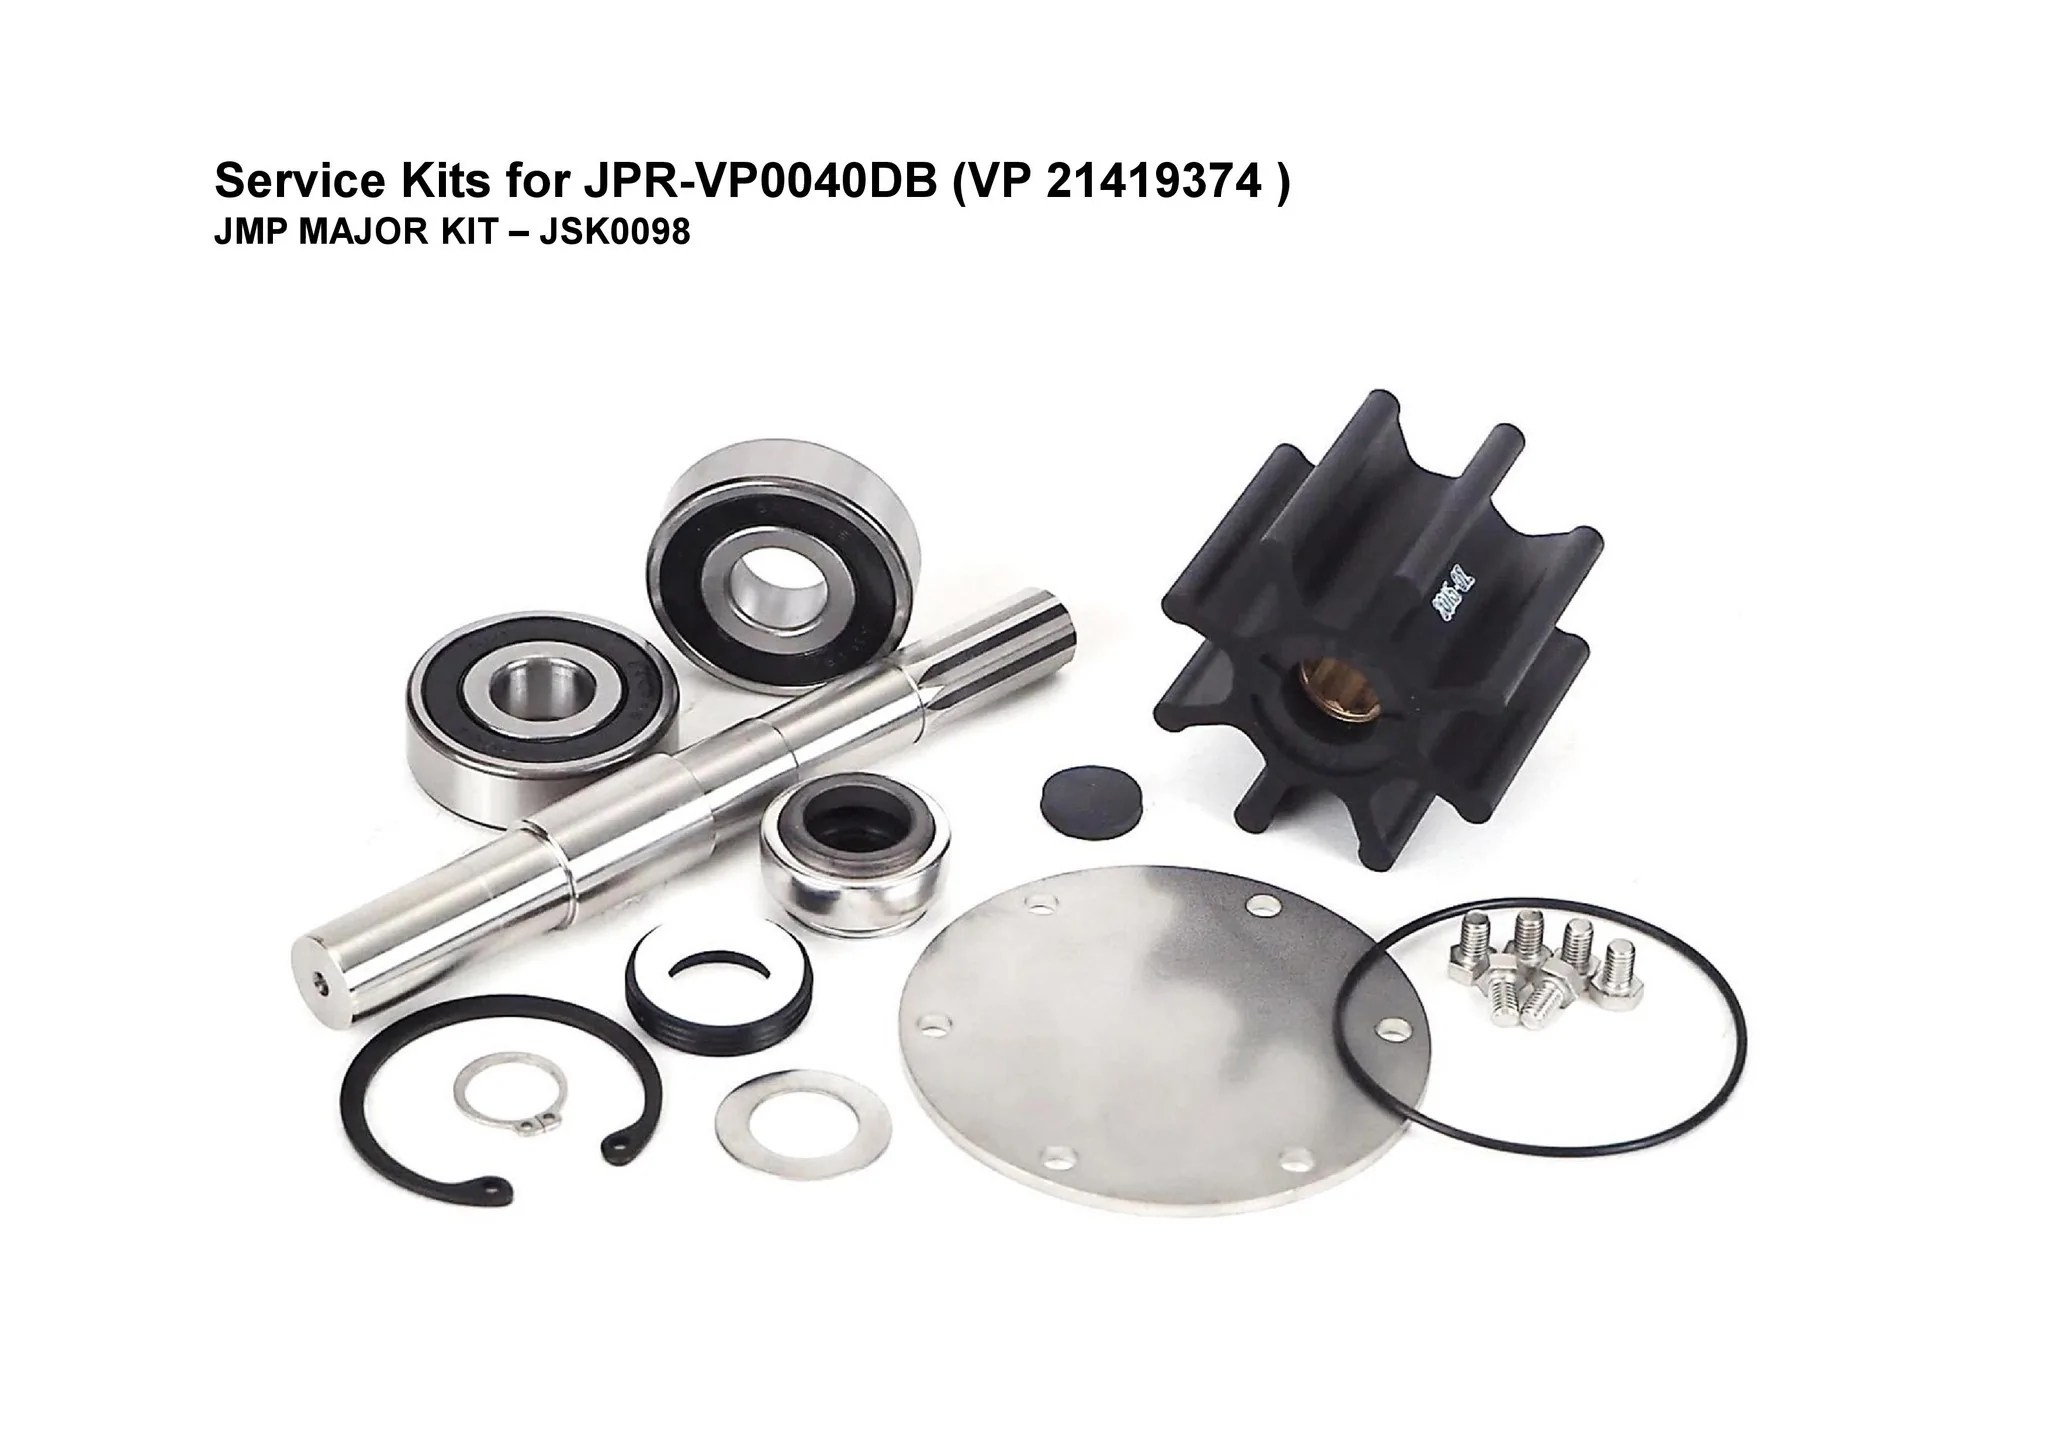 medium resolution of jmp jsk0098 major kit for jmp pump jpr vp0040db 21419374 fits volvo penta engines d4 225a e d4 260a e d4 260d e d4 300a e d4 300d e